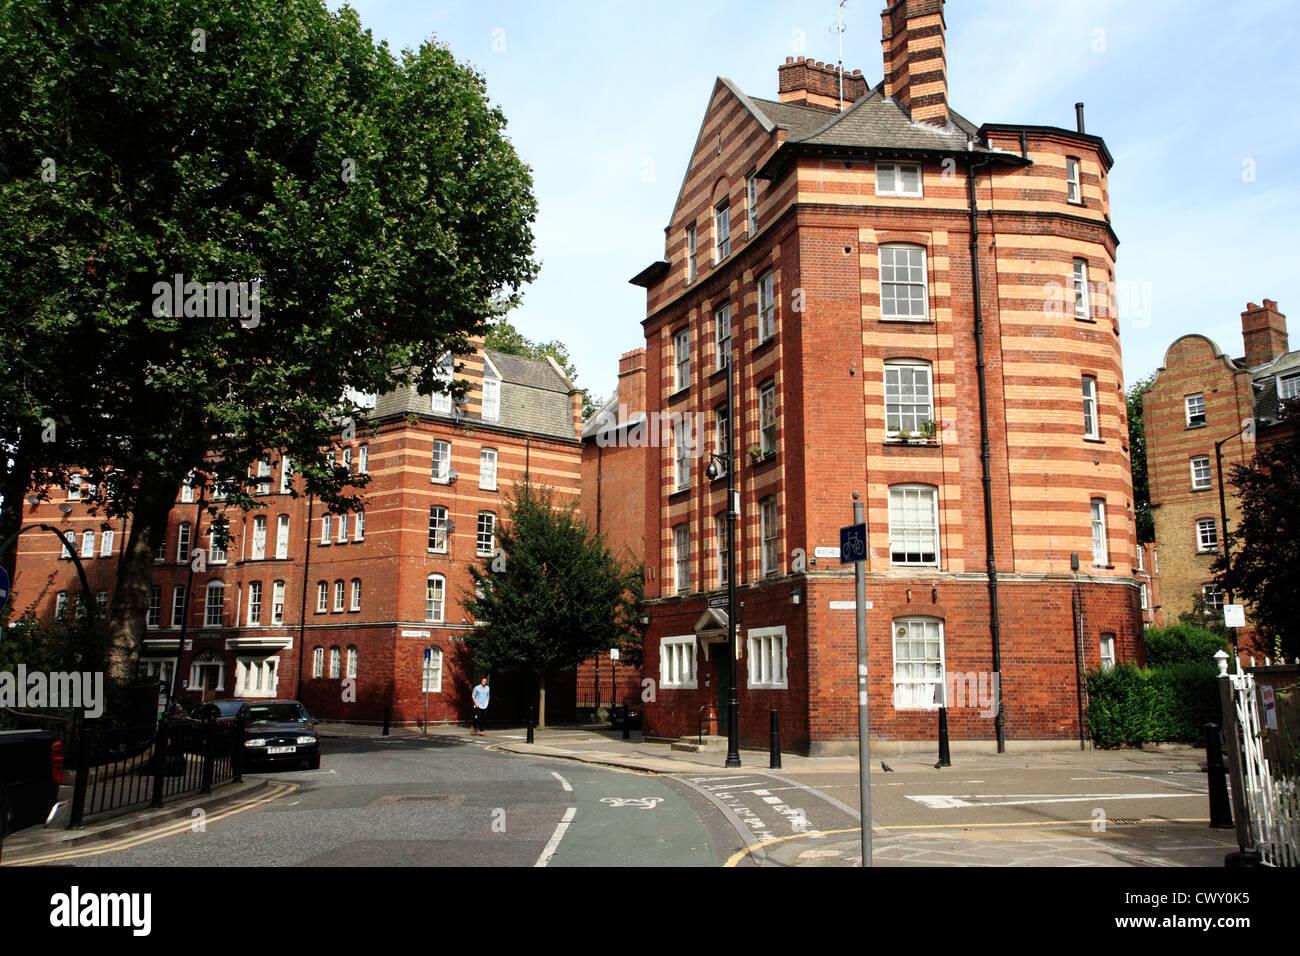 Arnold Circus, Boundary Estate, Bethnal Green, Londres, UK Photo Stock